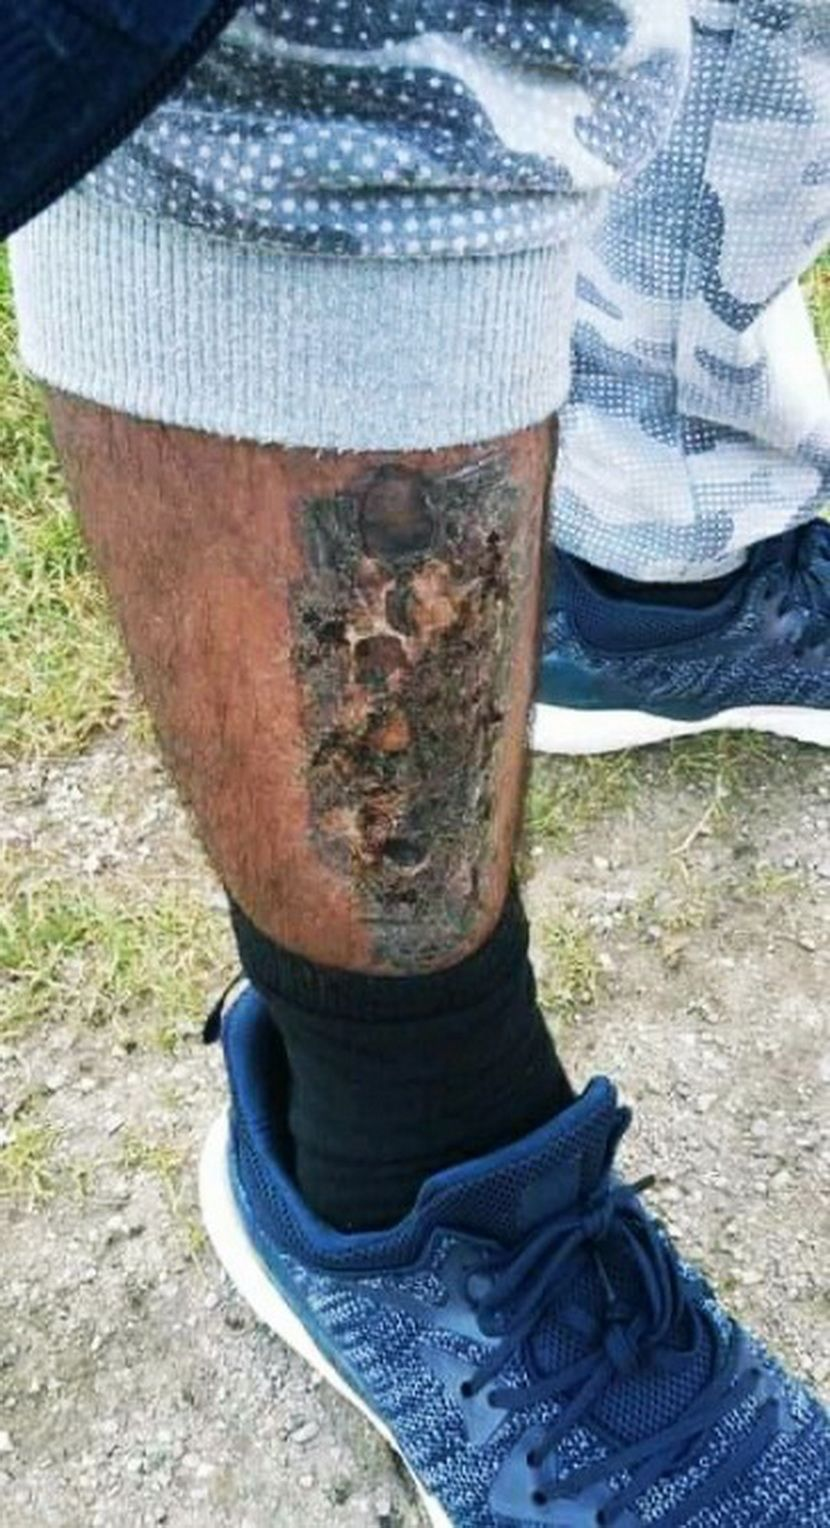 Migrant sa spaljenom nogom